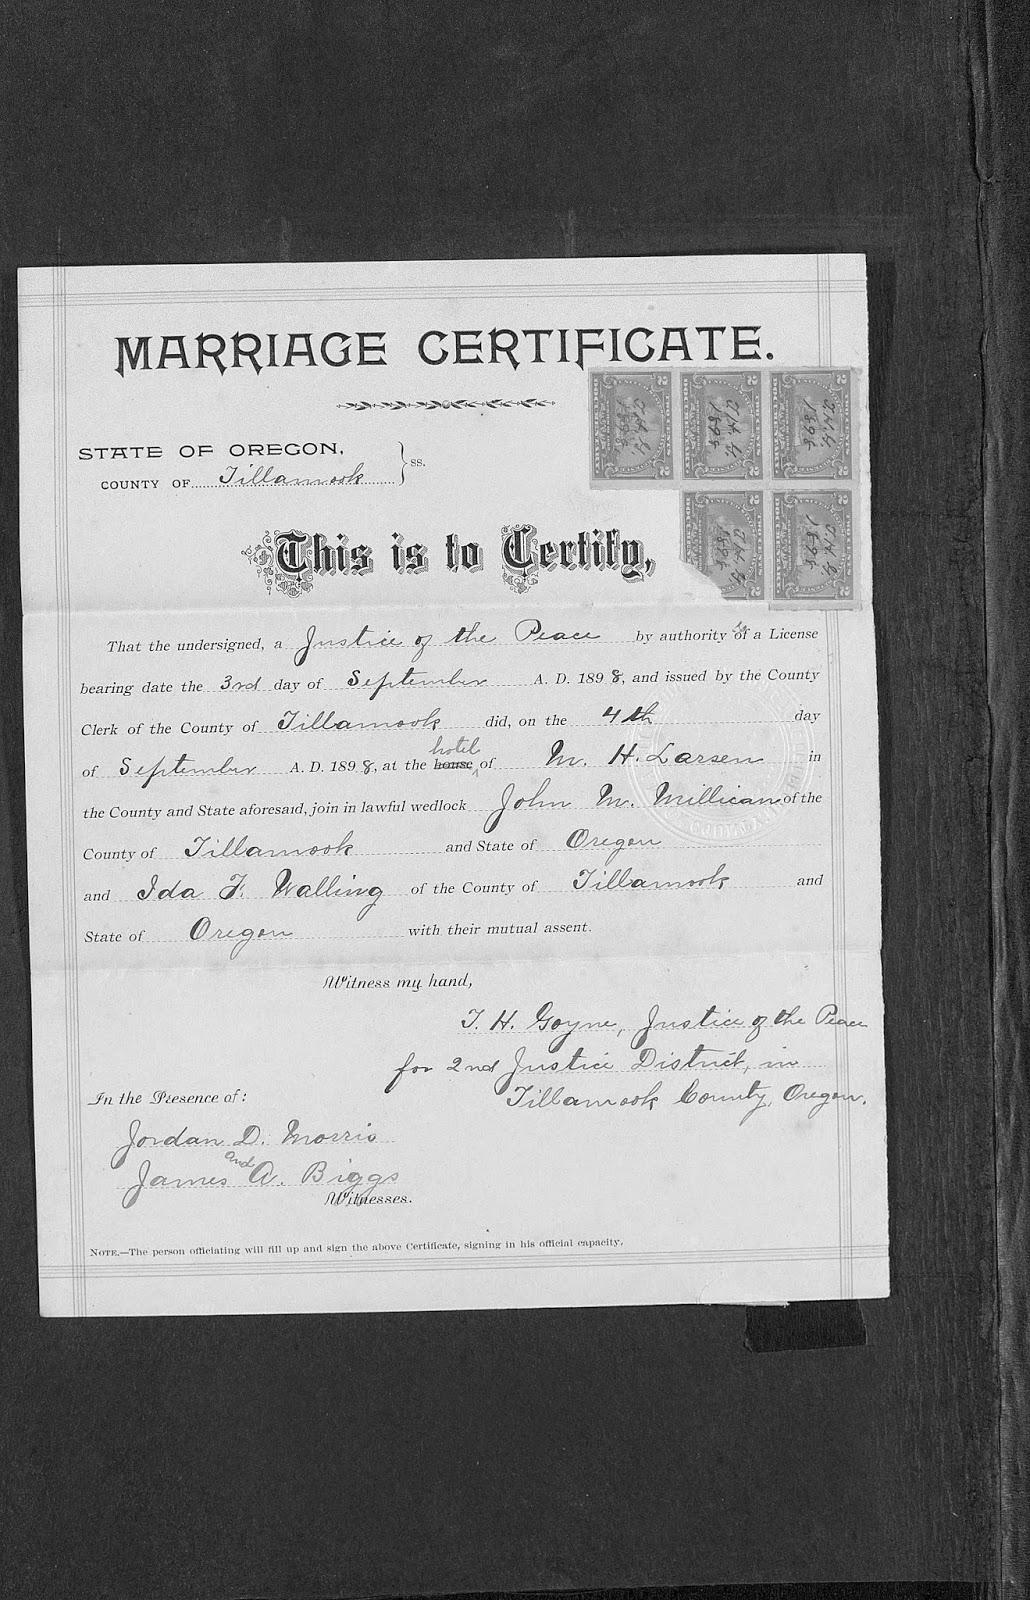 Millican carrara lippert et al genealogy blog census john m and ida f walling millican tillamook tillamook oregon aiddatafo Image collections